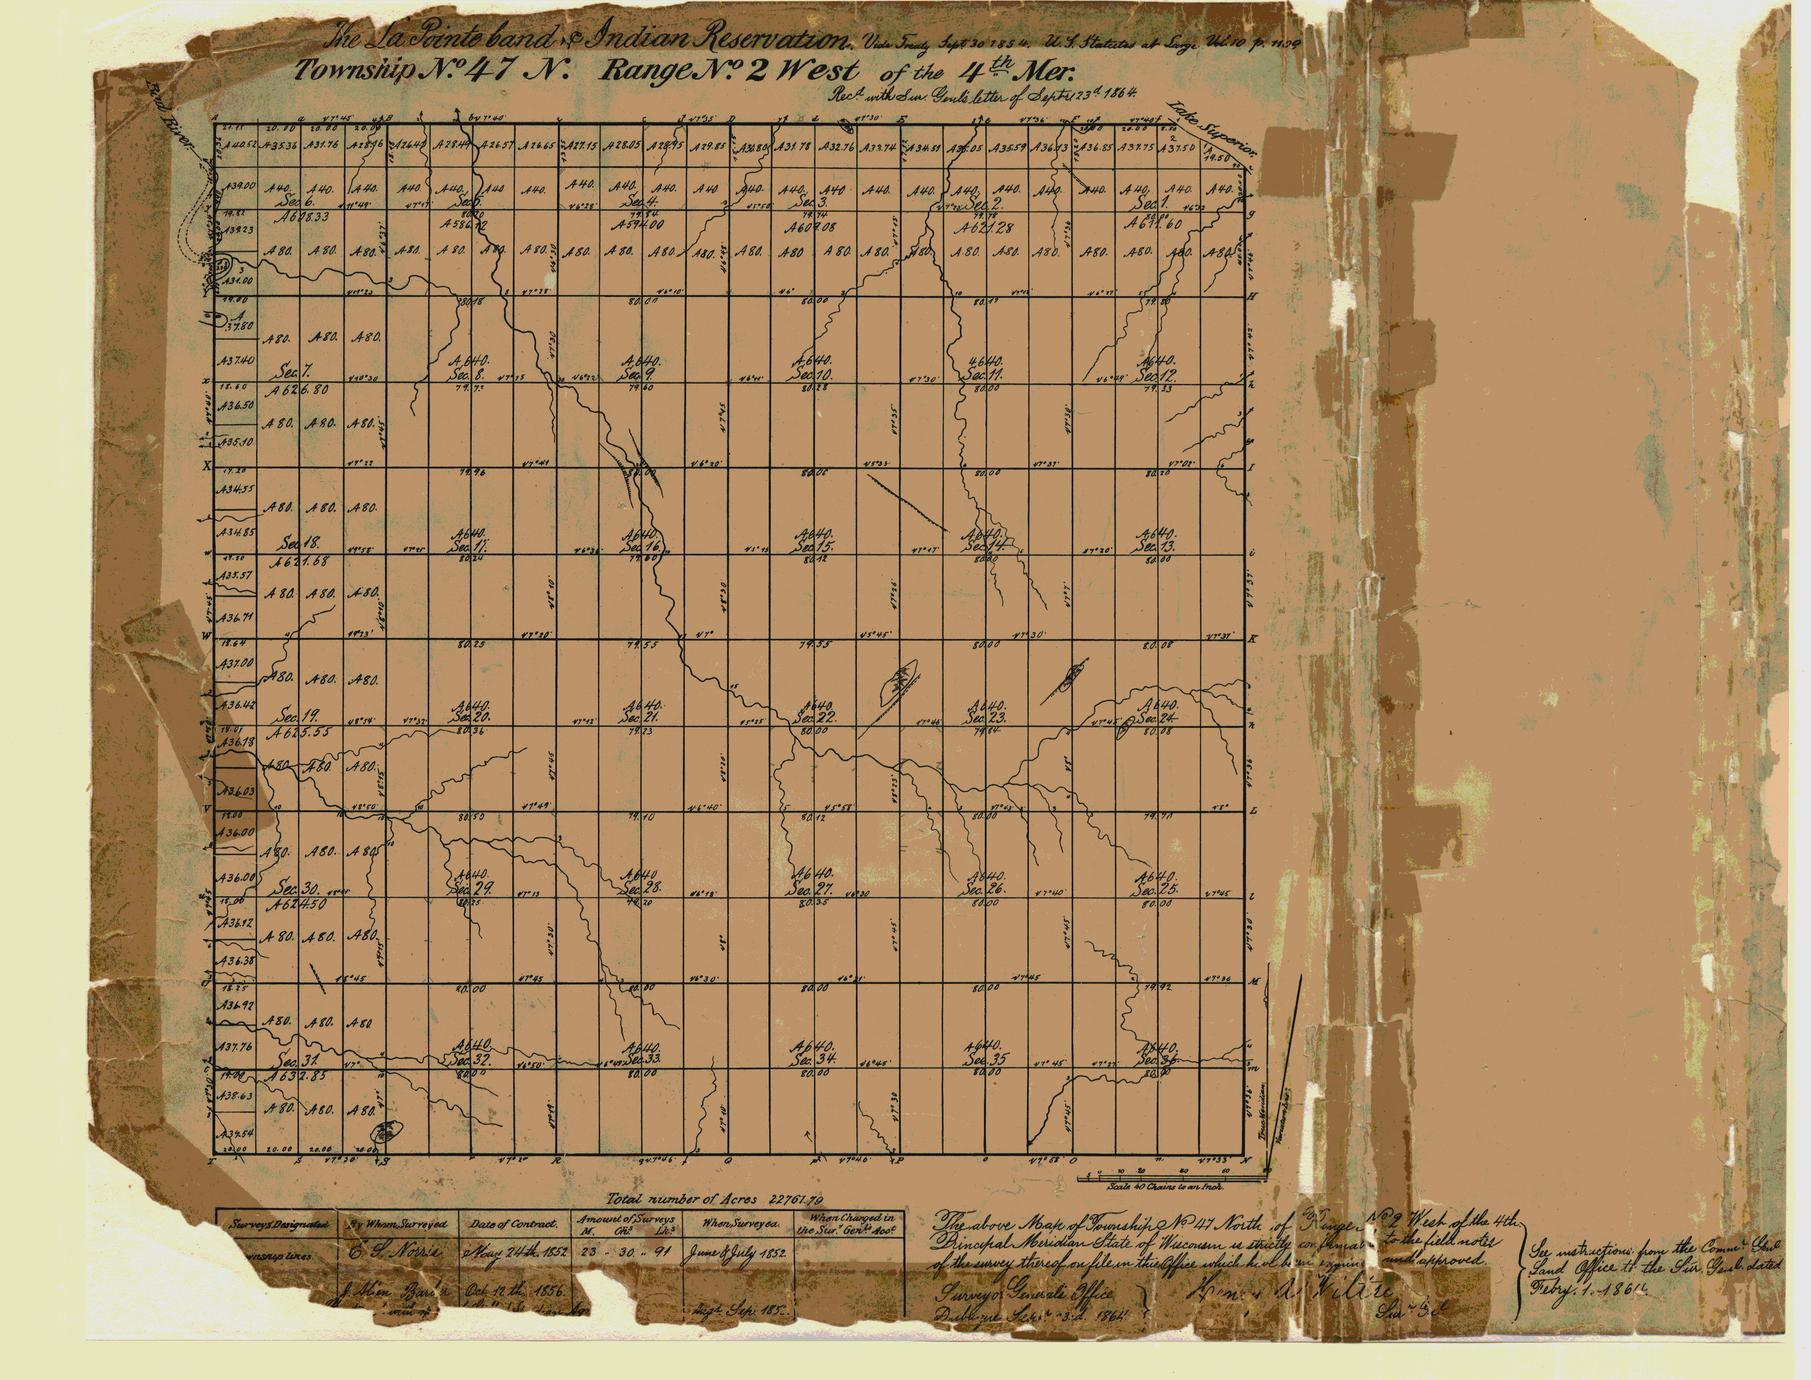 [Public Land Survey System map: Wisconsin Township 47 North, Range 02 West]